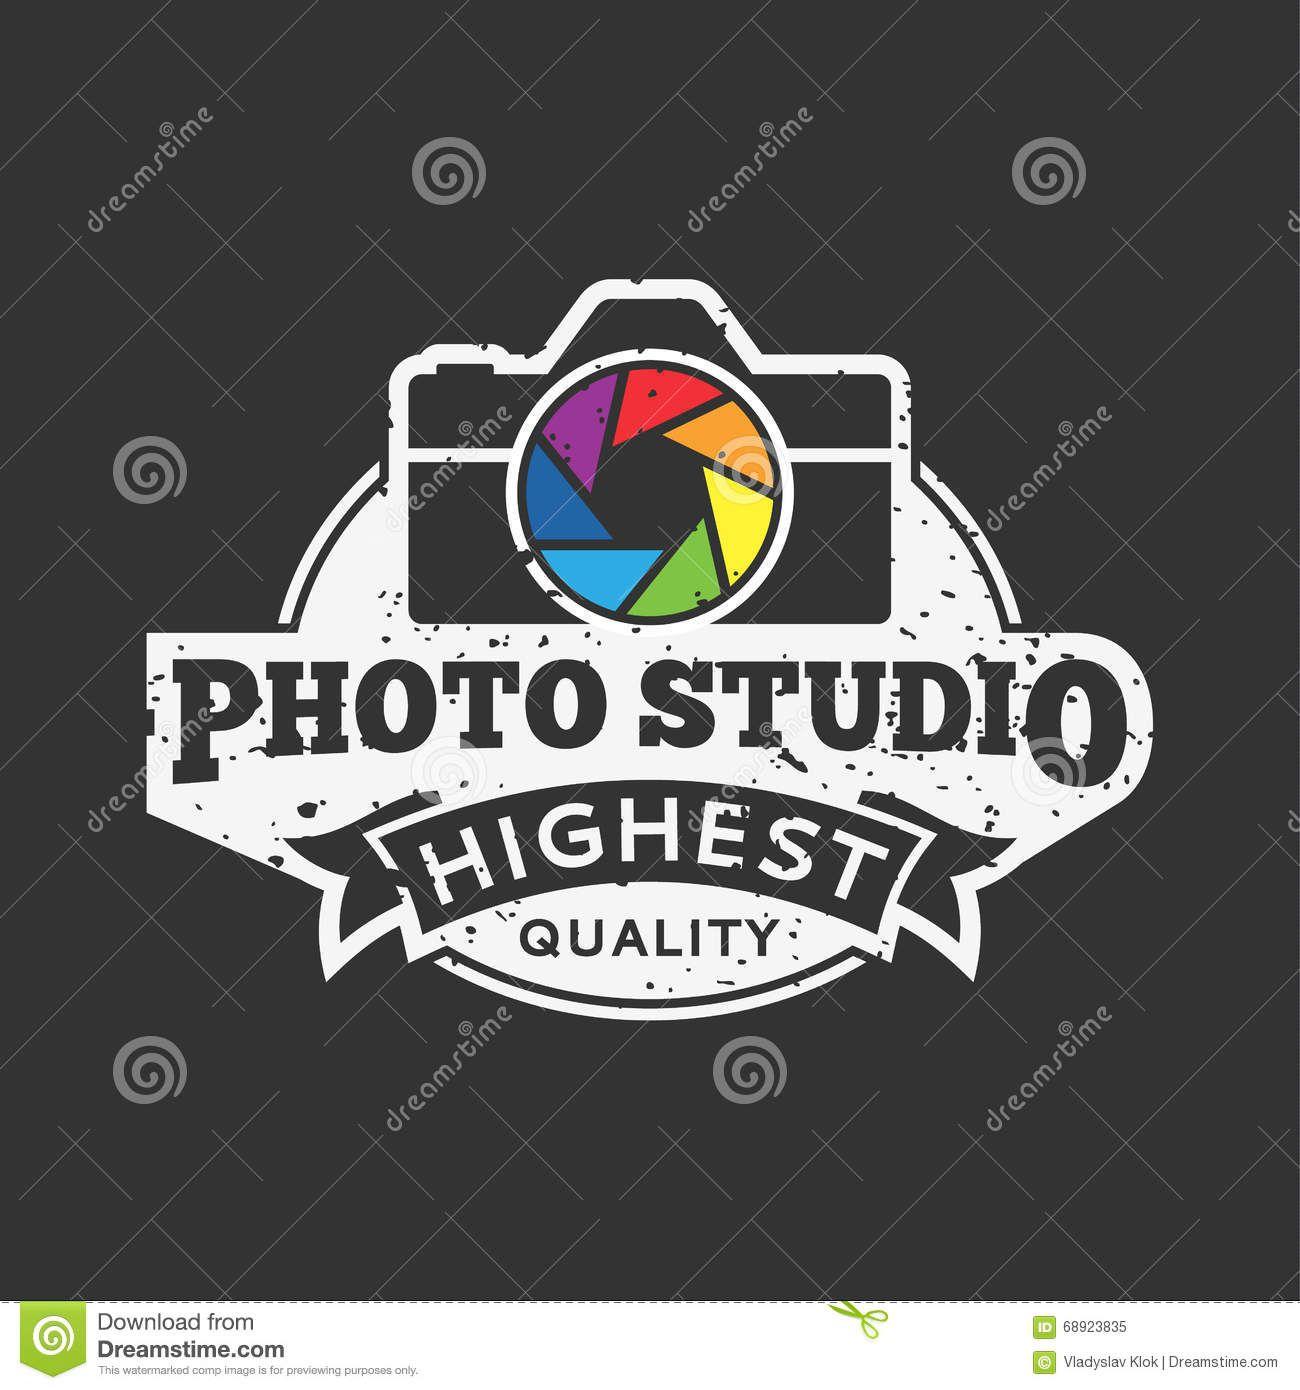 Image result for photostudio logo | Logo desing, Photo